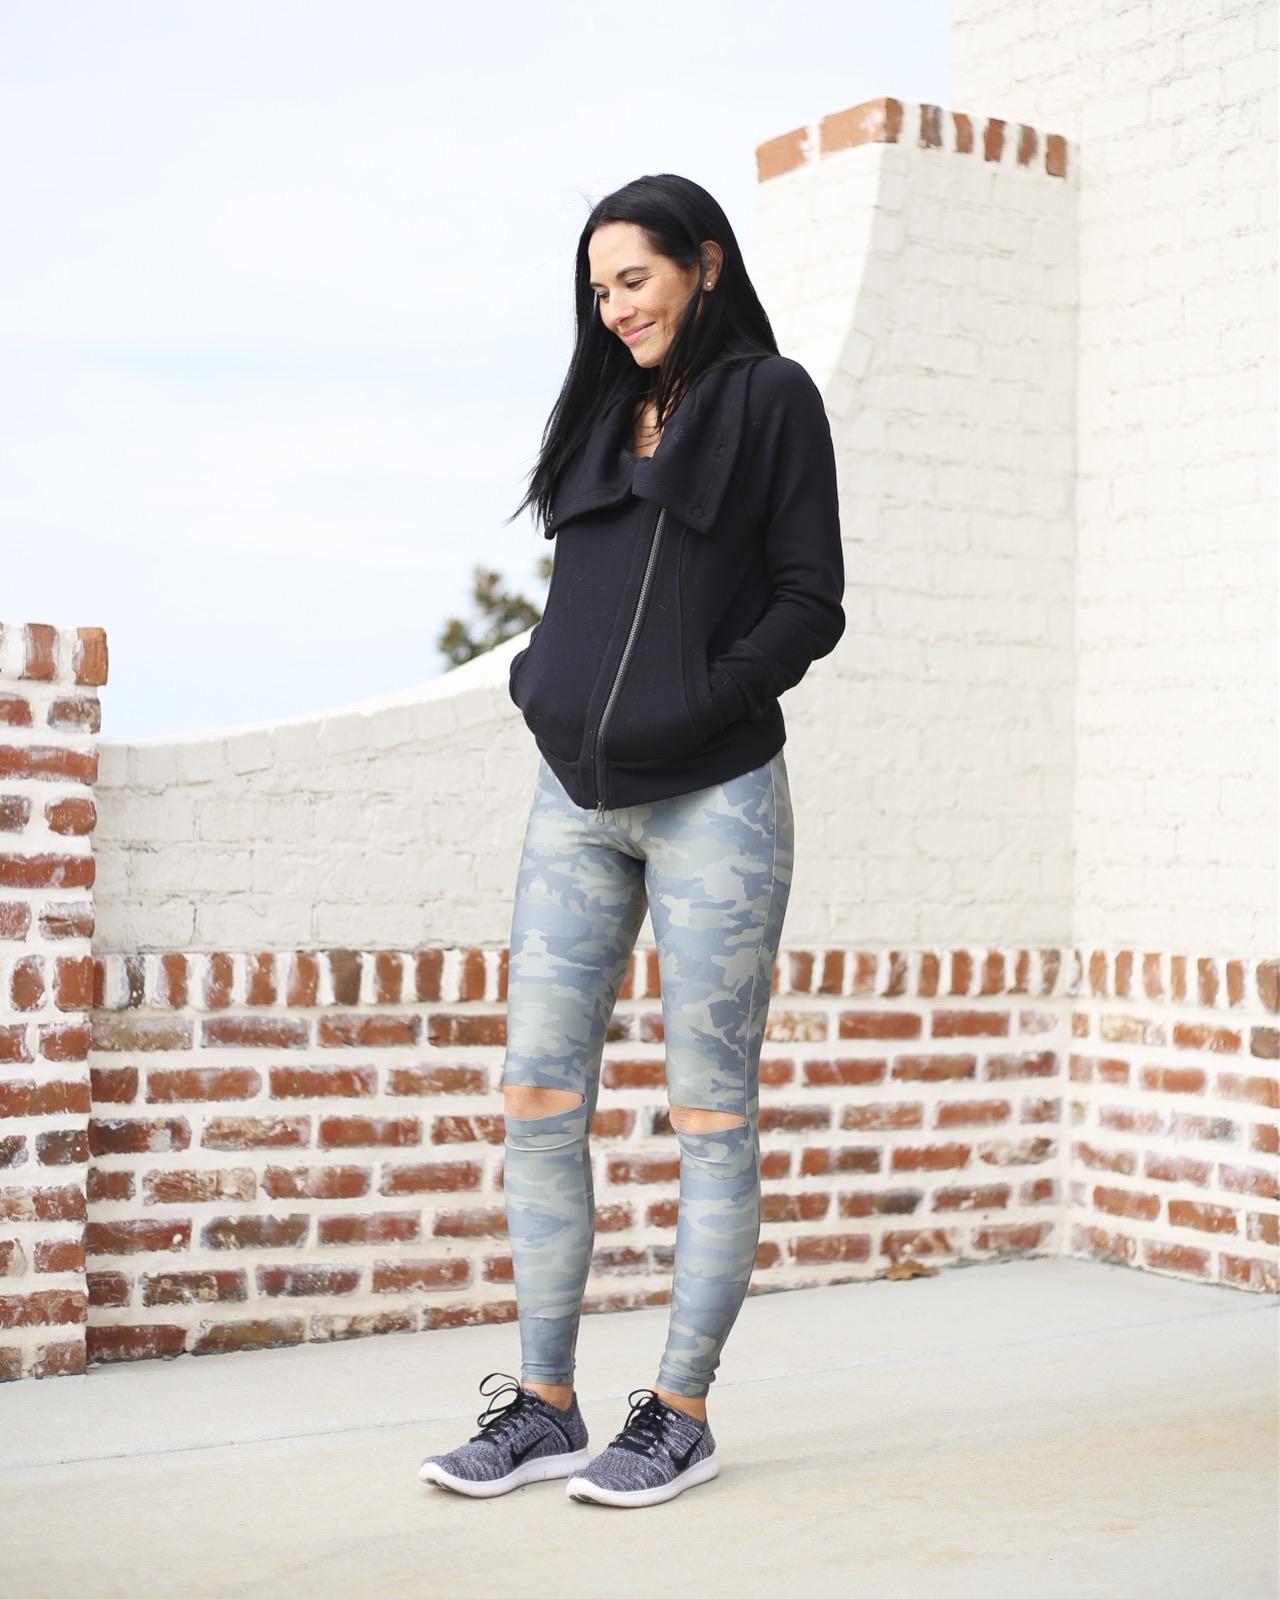 Nike  sneakers  |  leggings  | jumper  similar  | photo: Sydney Clawson